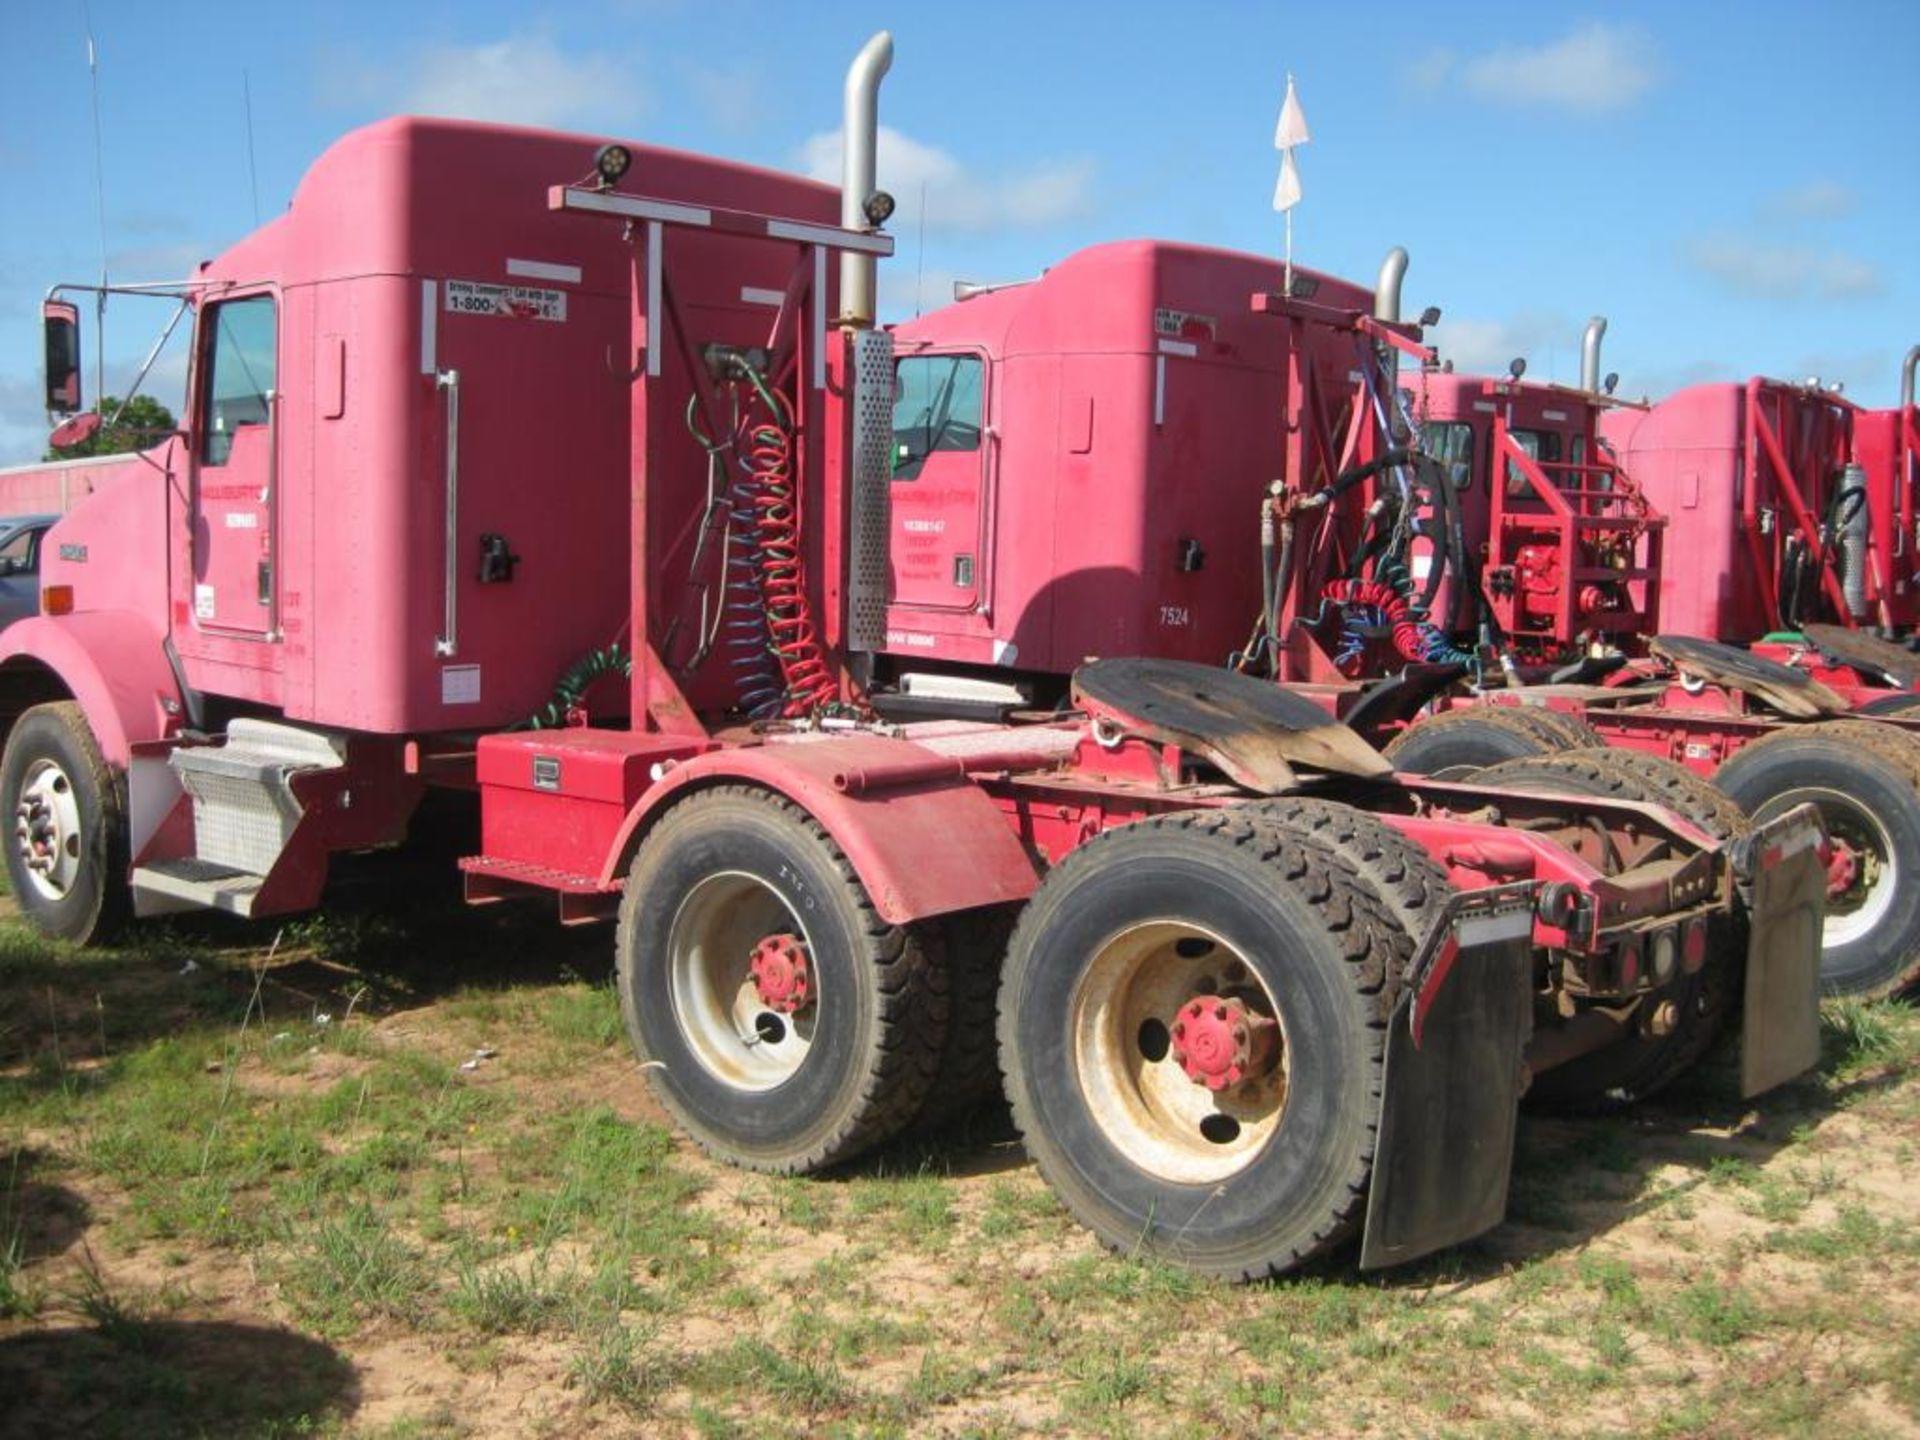 Kenworth Truck - Image 5 of 21